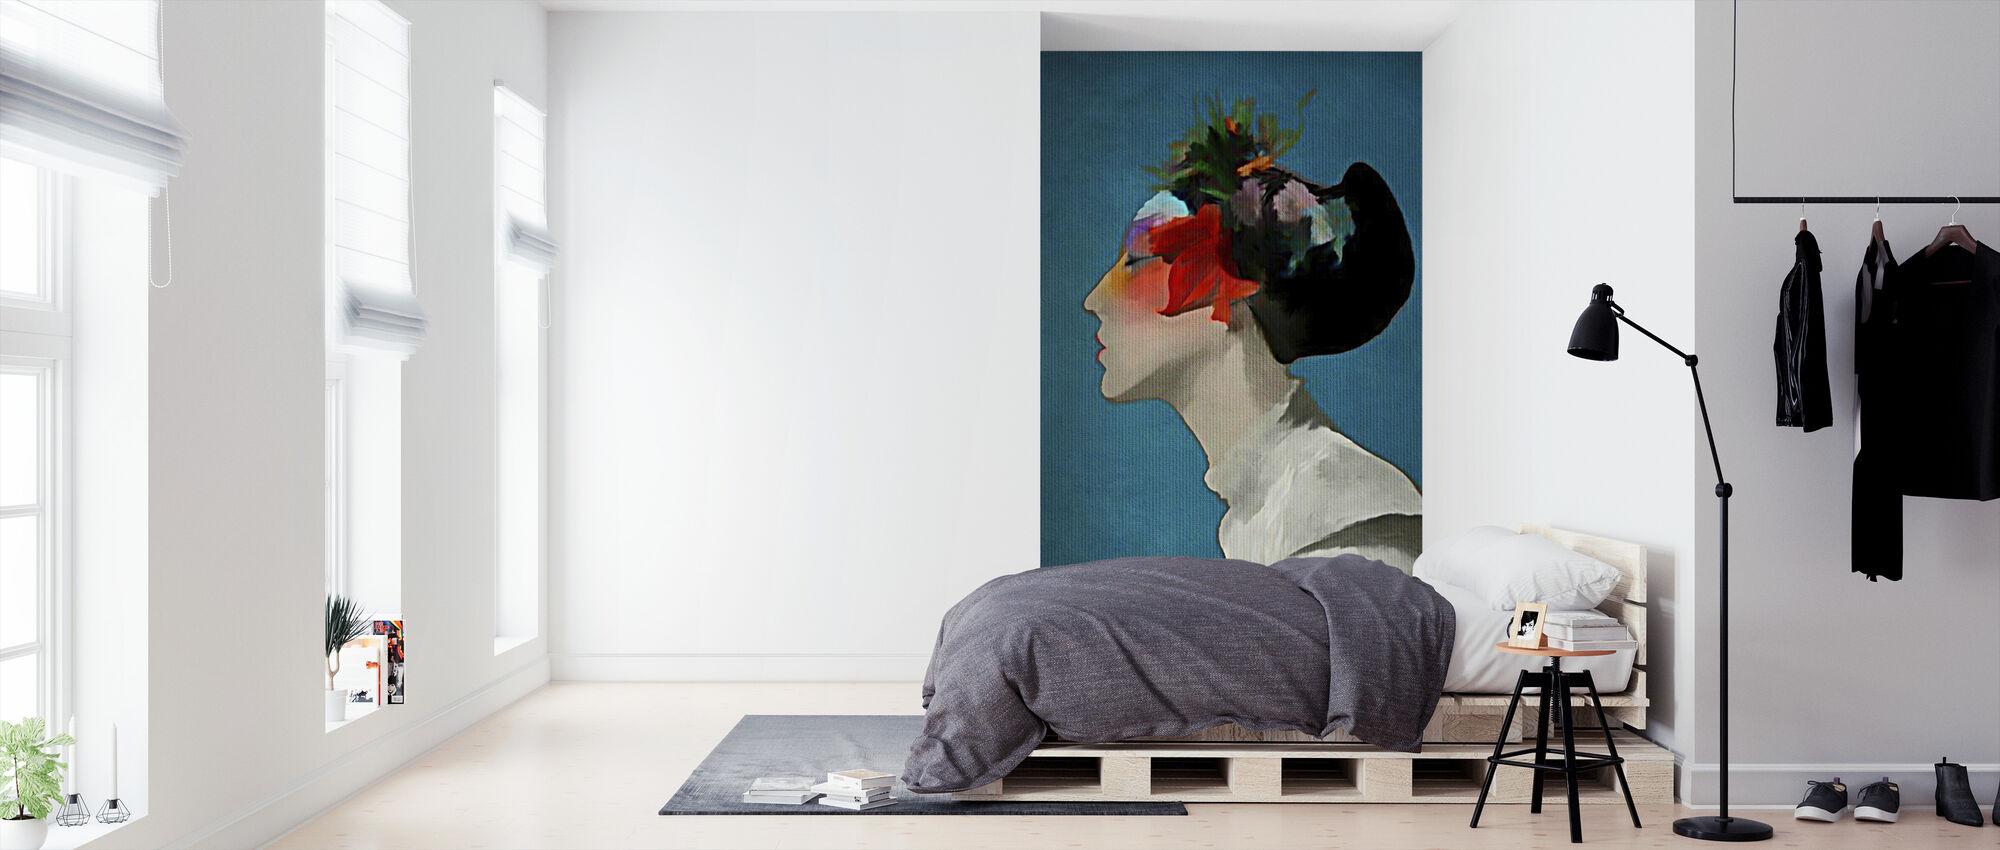 Kimono - Behang - Slaapkamer